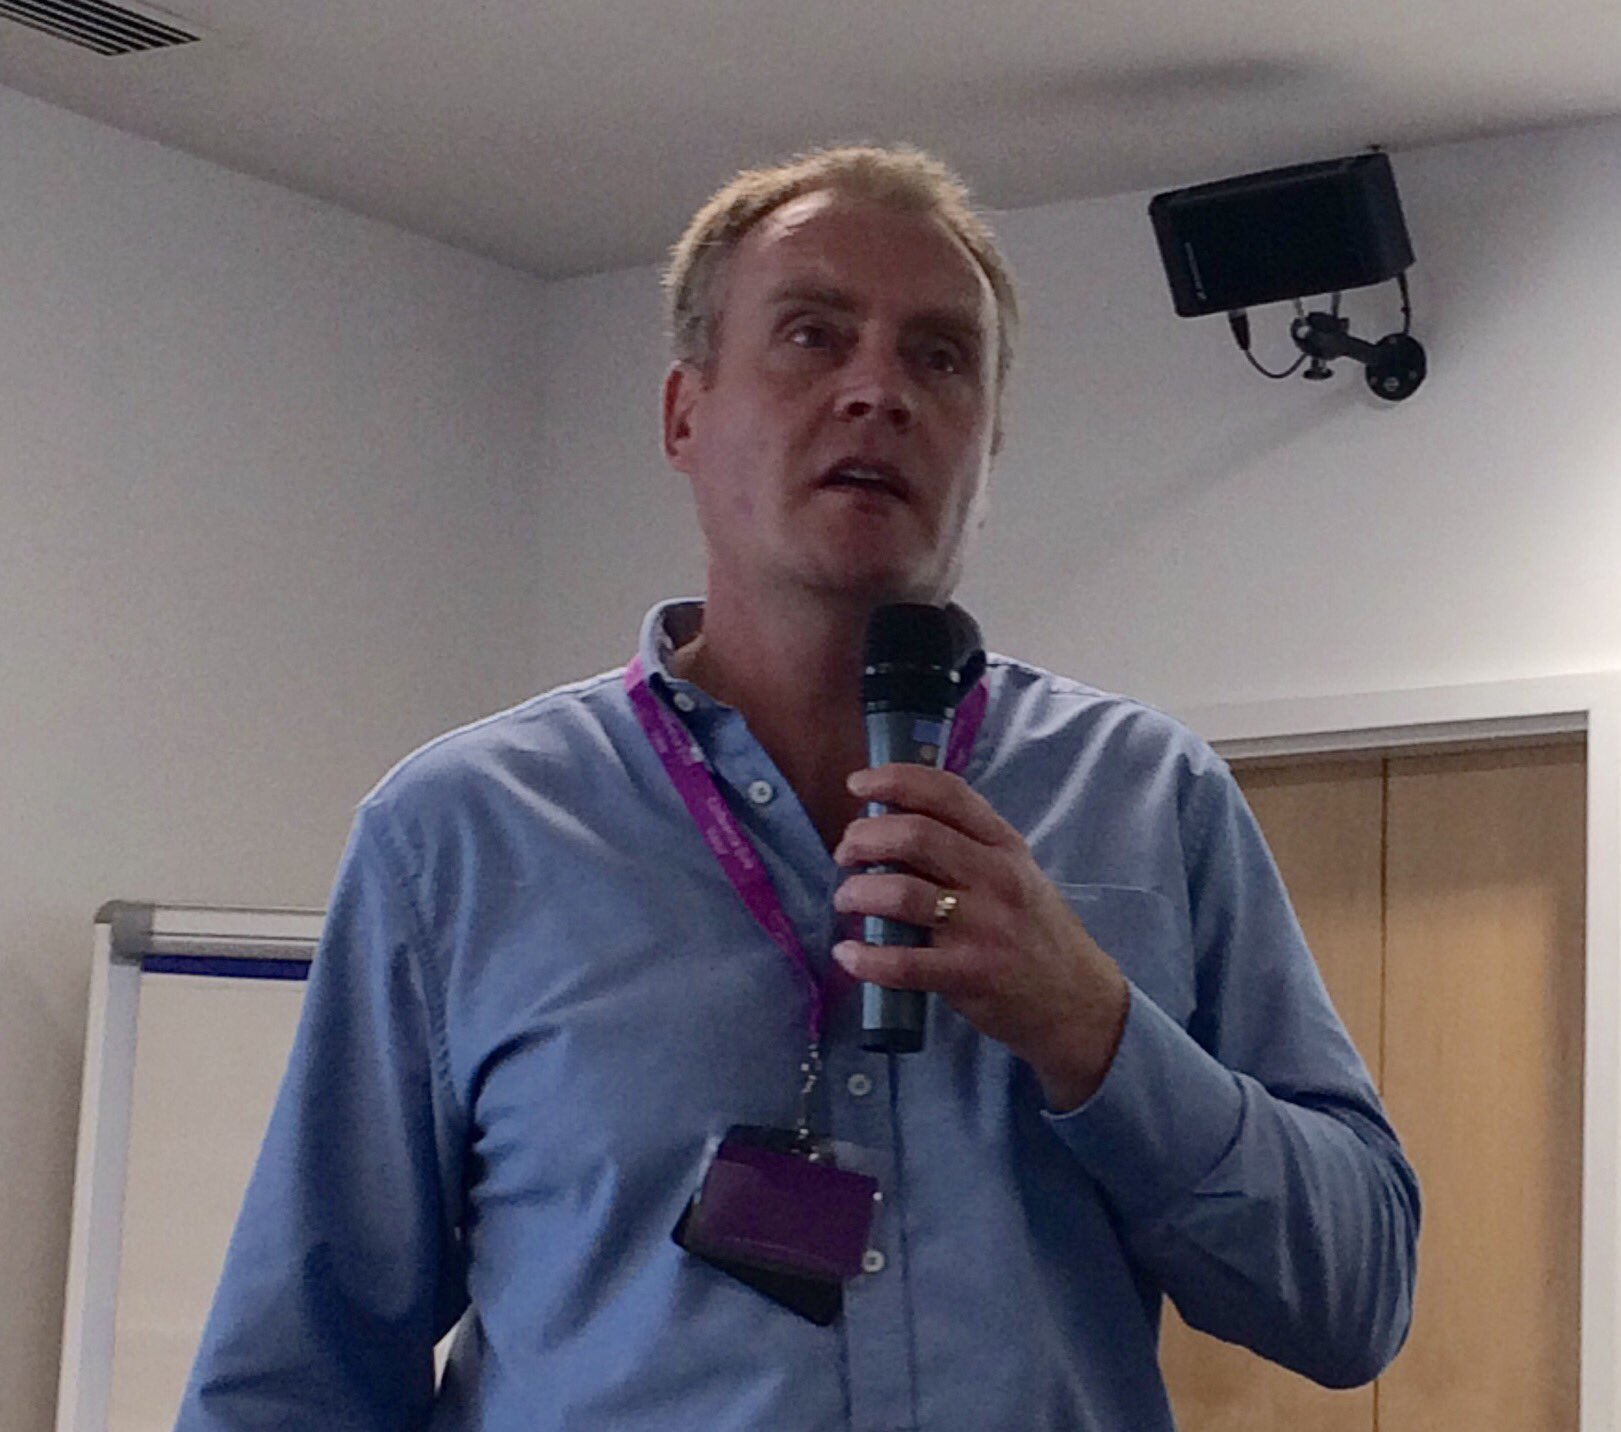 Dr Steven Buchanan kicks off #scotinfolit with a fantastic insight into information behaviour @UniStrathclyde https://t.co/6x1aafngaA